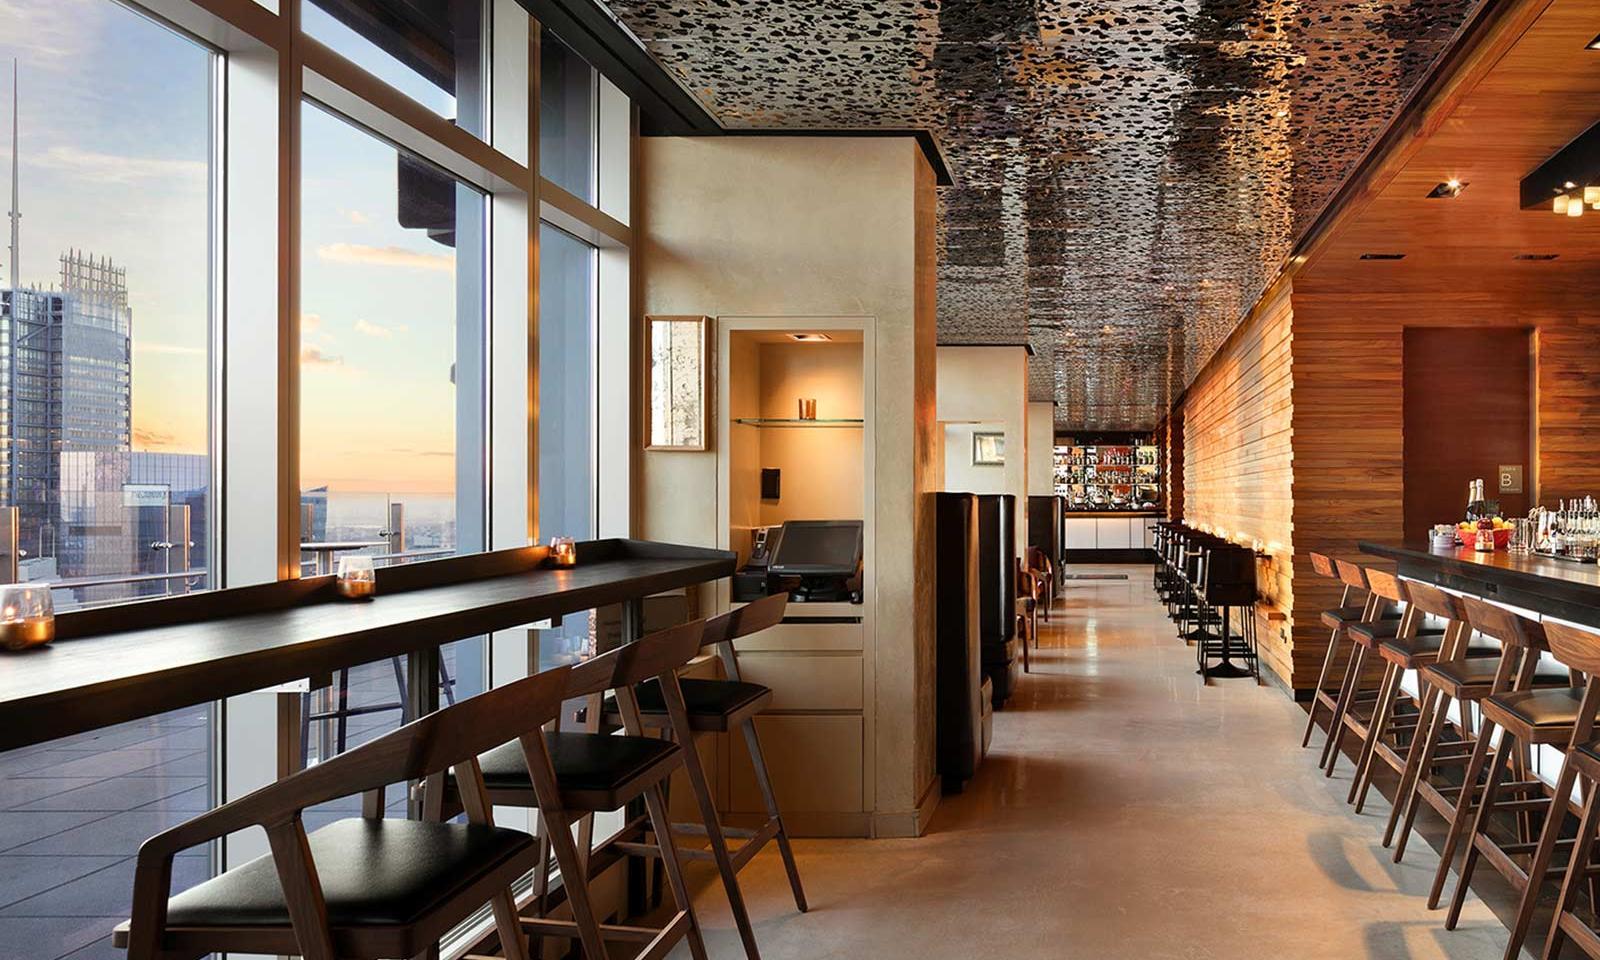 BAR 54 - Sensationelle Rooftop-Bar am Times Square